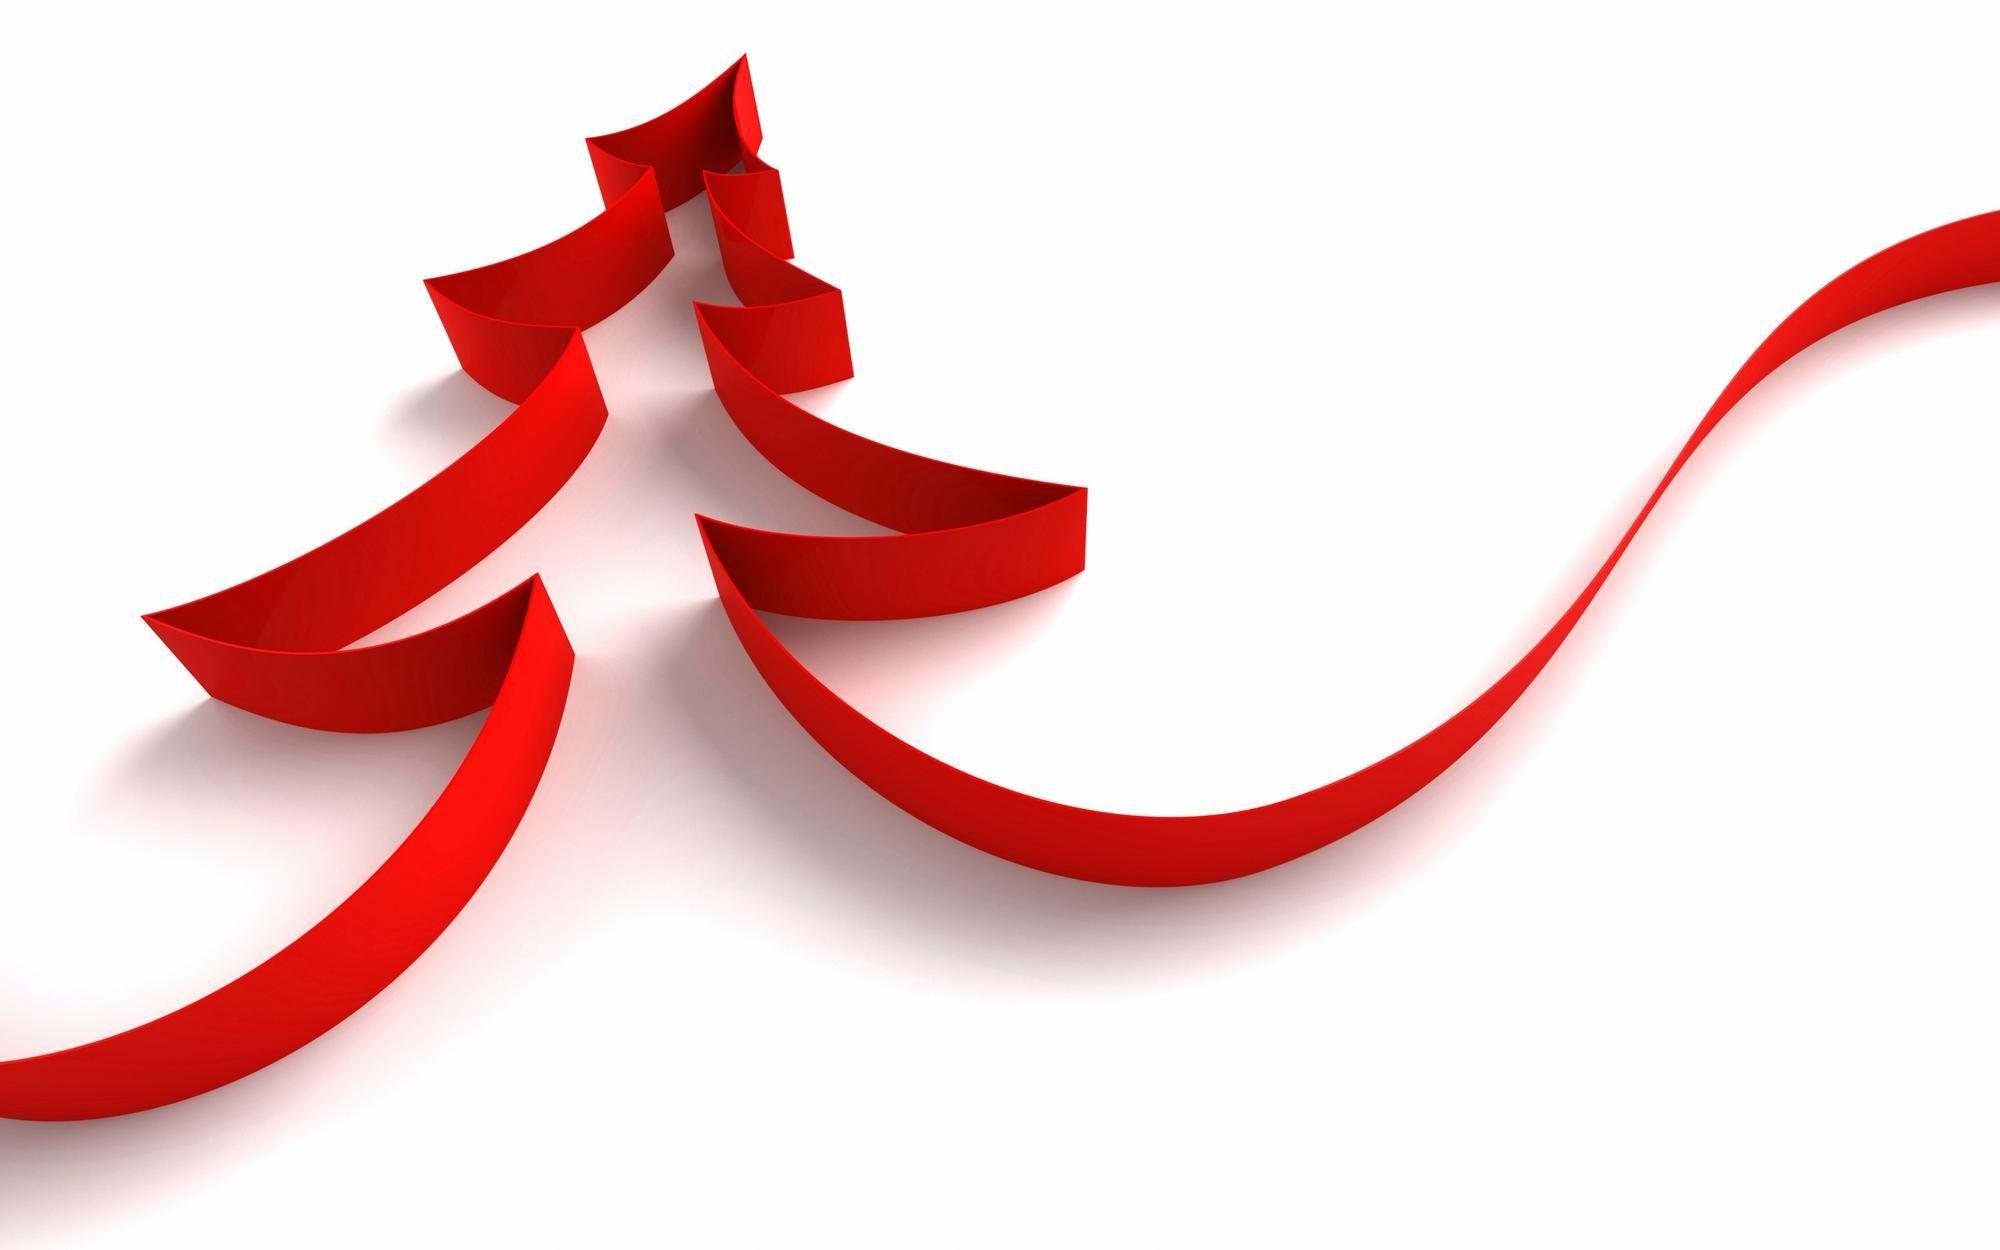 ribbon dream meaning, dream about ribbon, ribbon dream interpretation, seeing in a dream ribbon